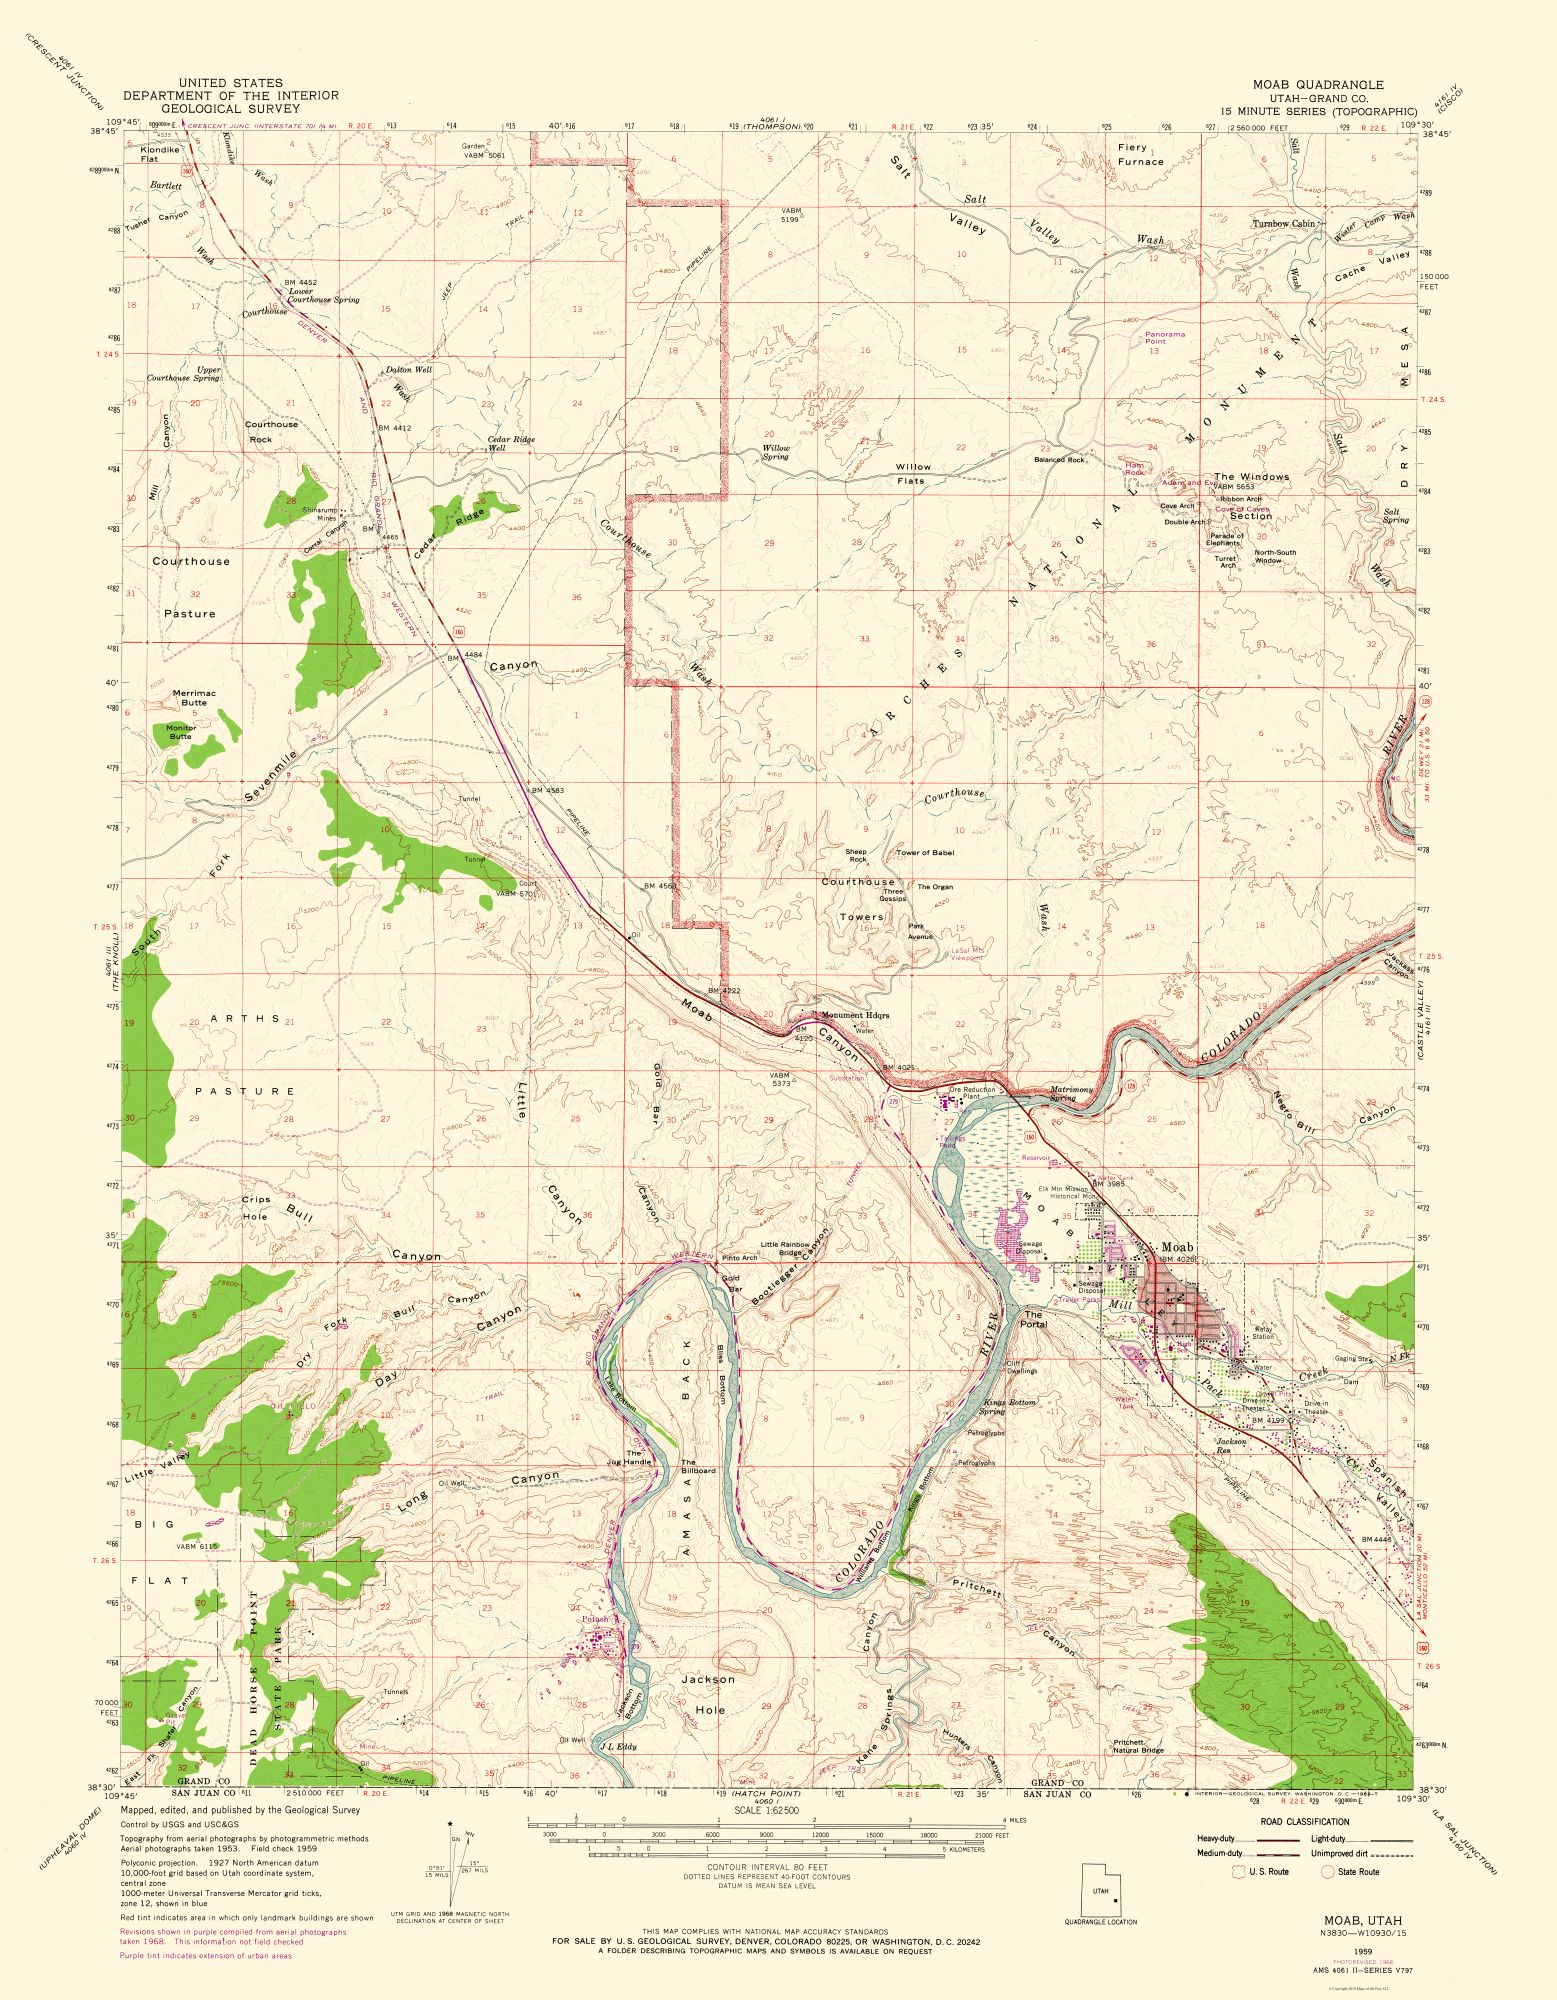 Historical Topographical Maps | Moab Utah Quad - USGS 1959 - 23 x 29.54